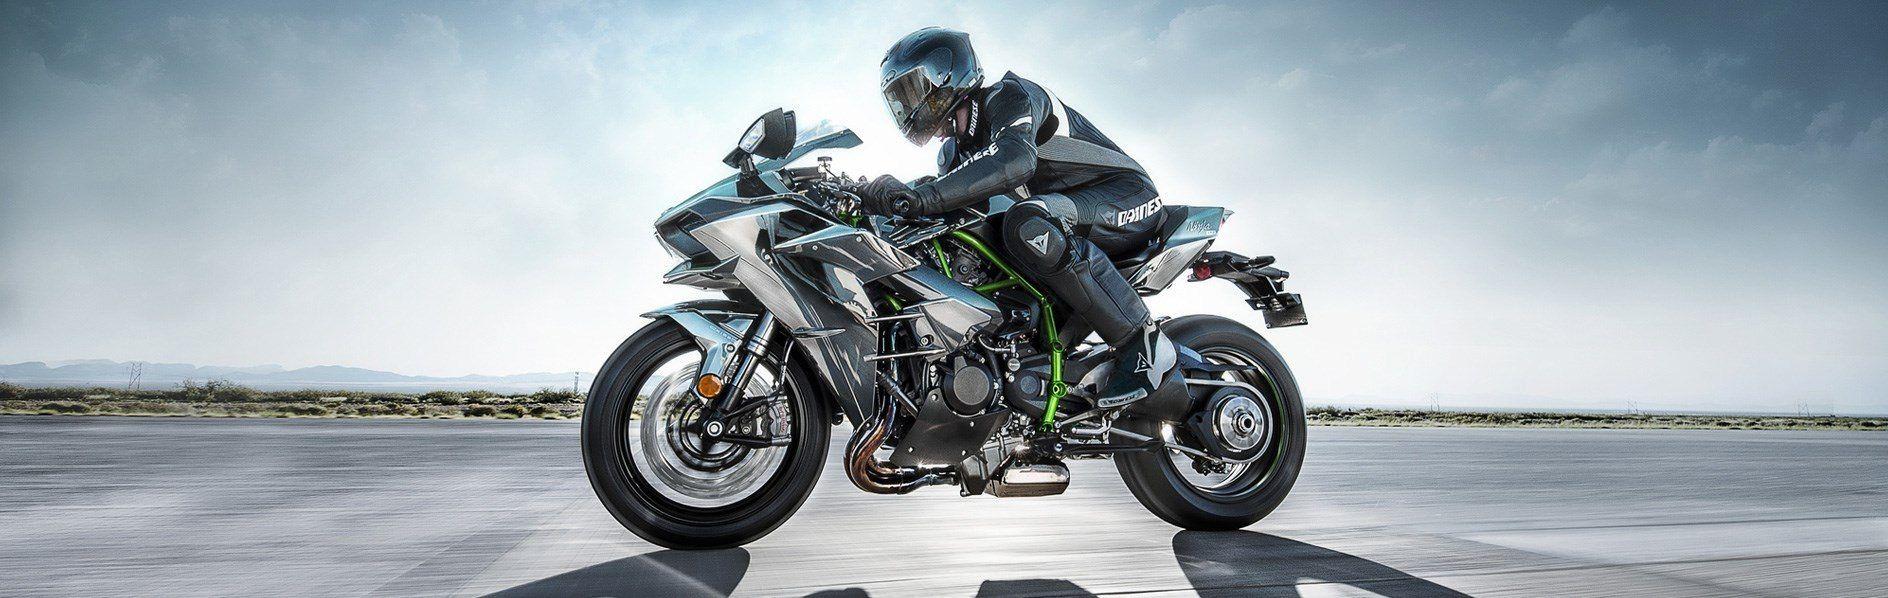 denver's favorite motorcycle shop vickery yamaha kawasaki polaris